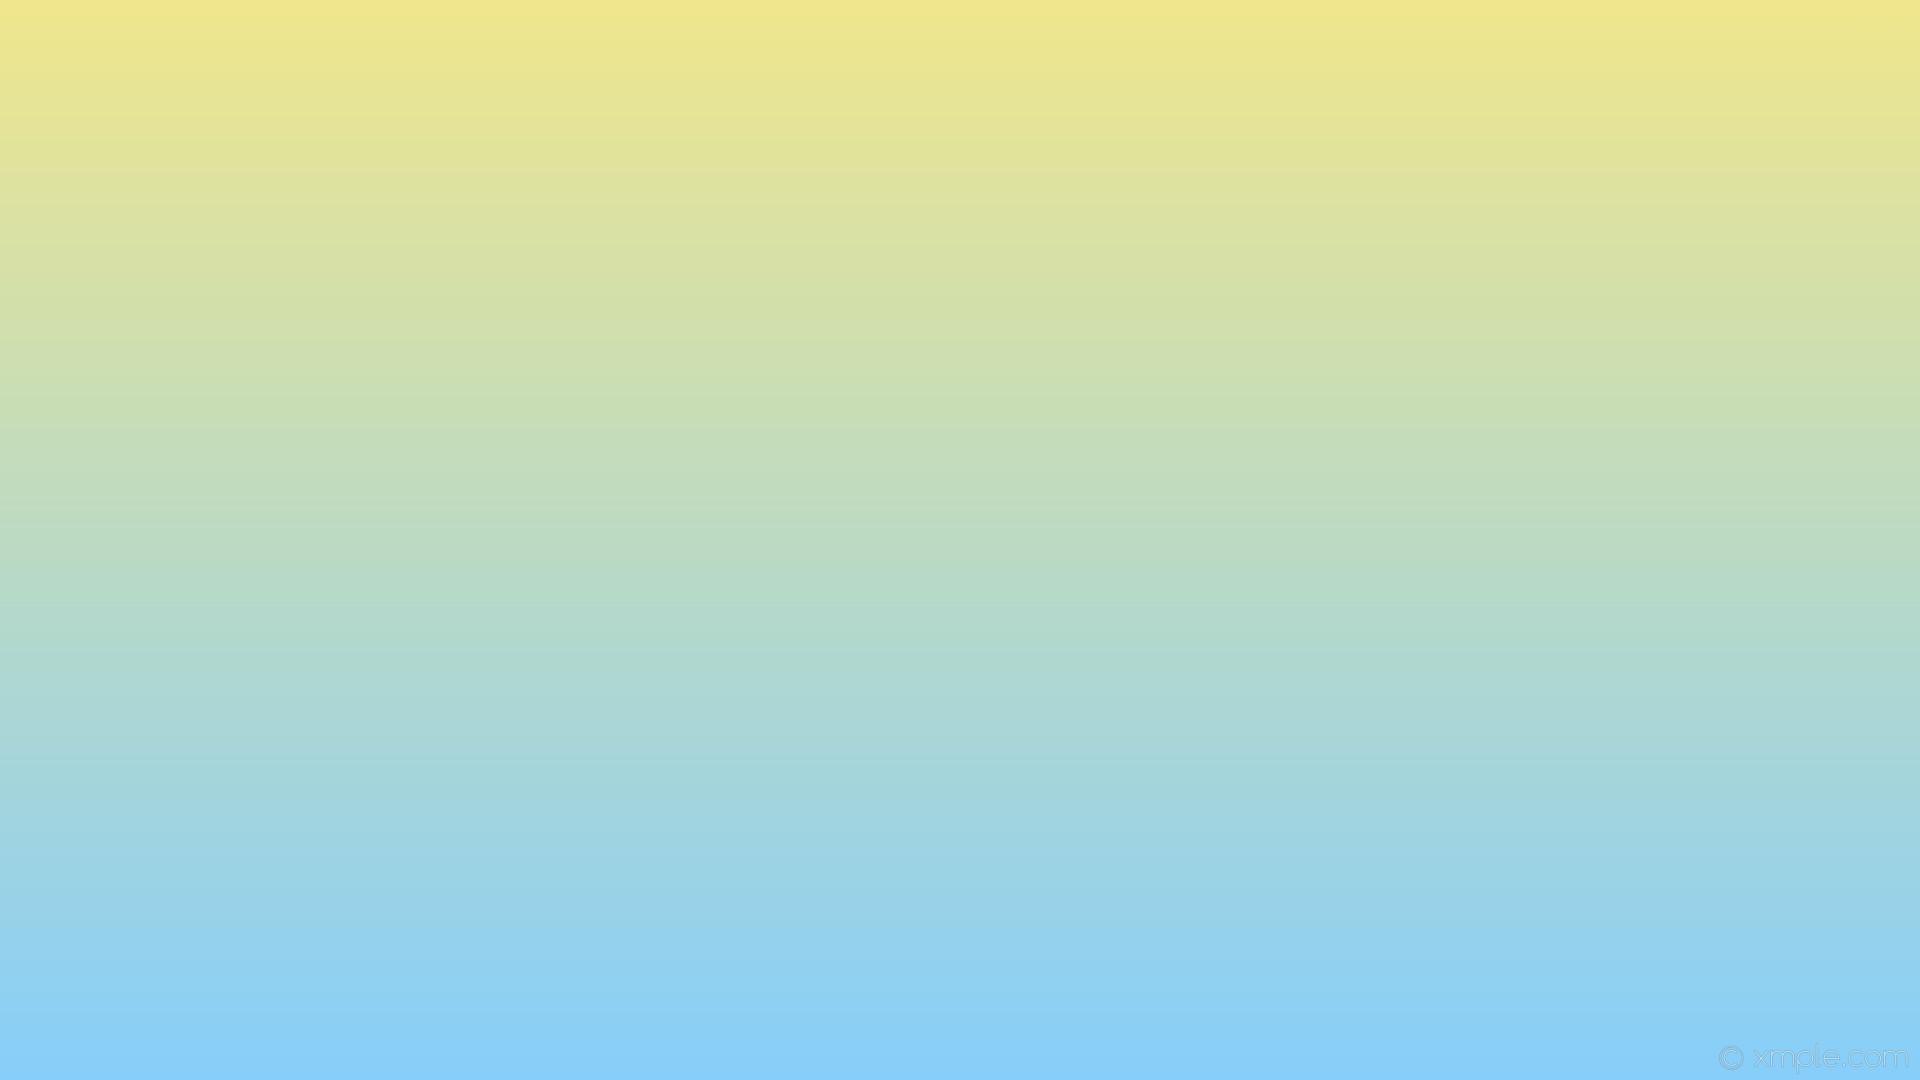 wallpaper blue gradient yellow linear light sky blue khaki #87cefa #f0e68c  270°